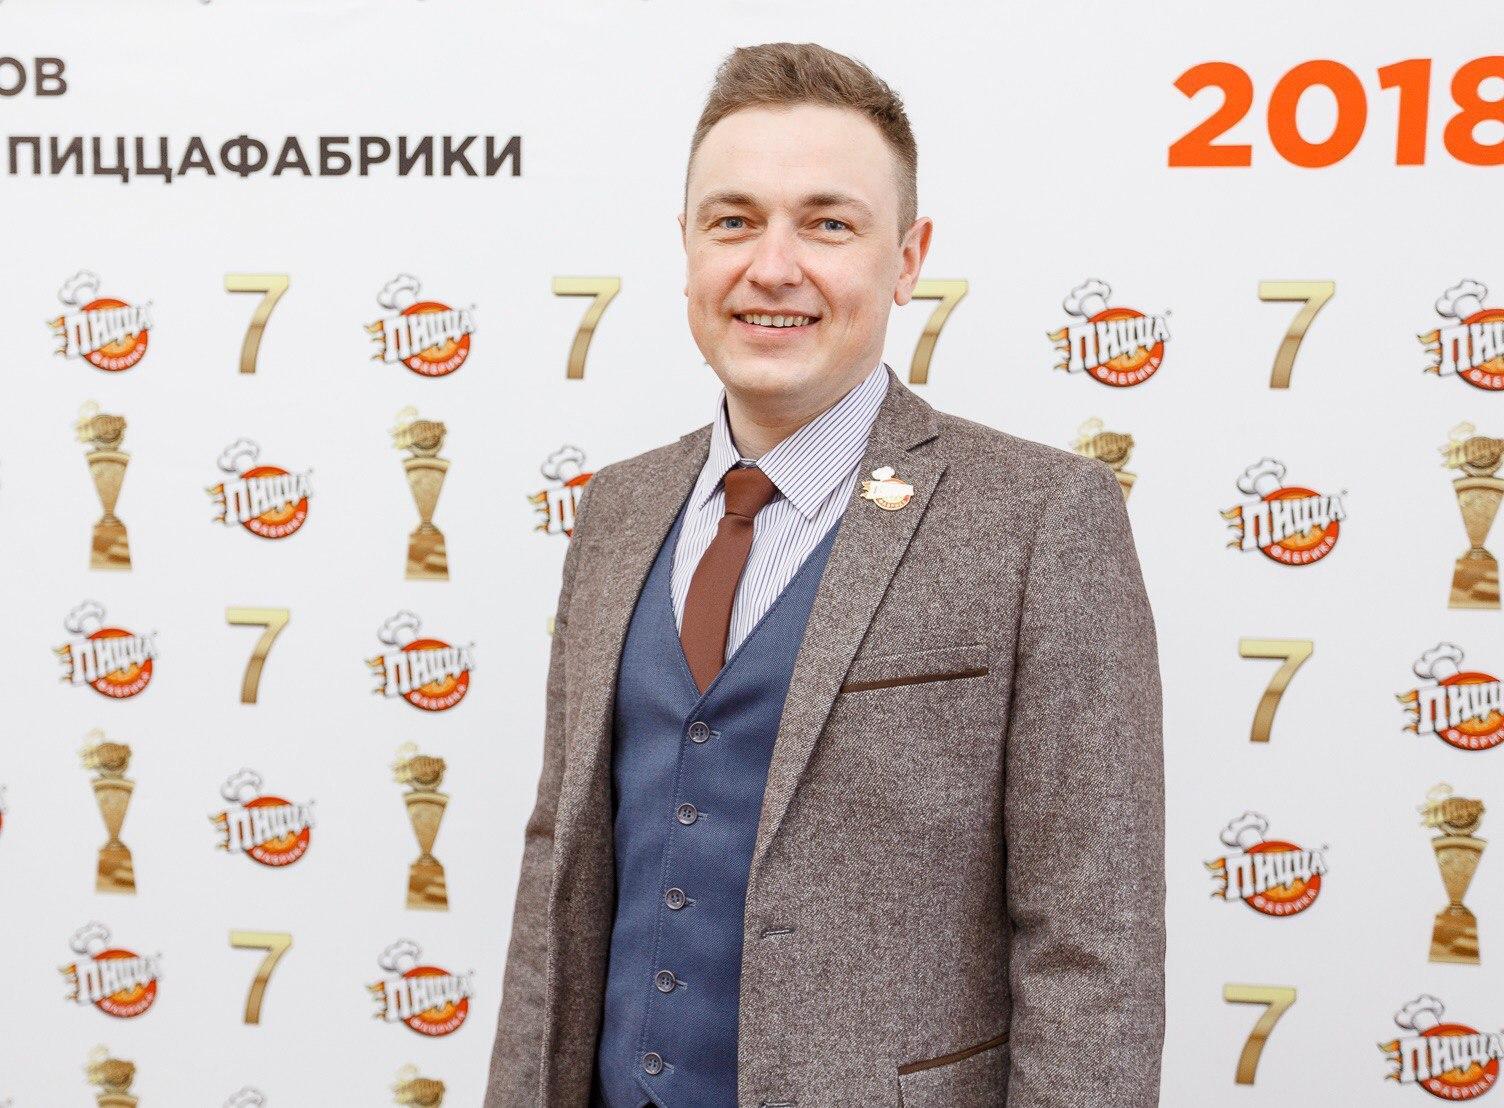 Директор по развитию компании ПиццаФабрика Олег Россохин